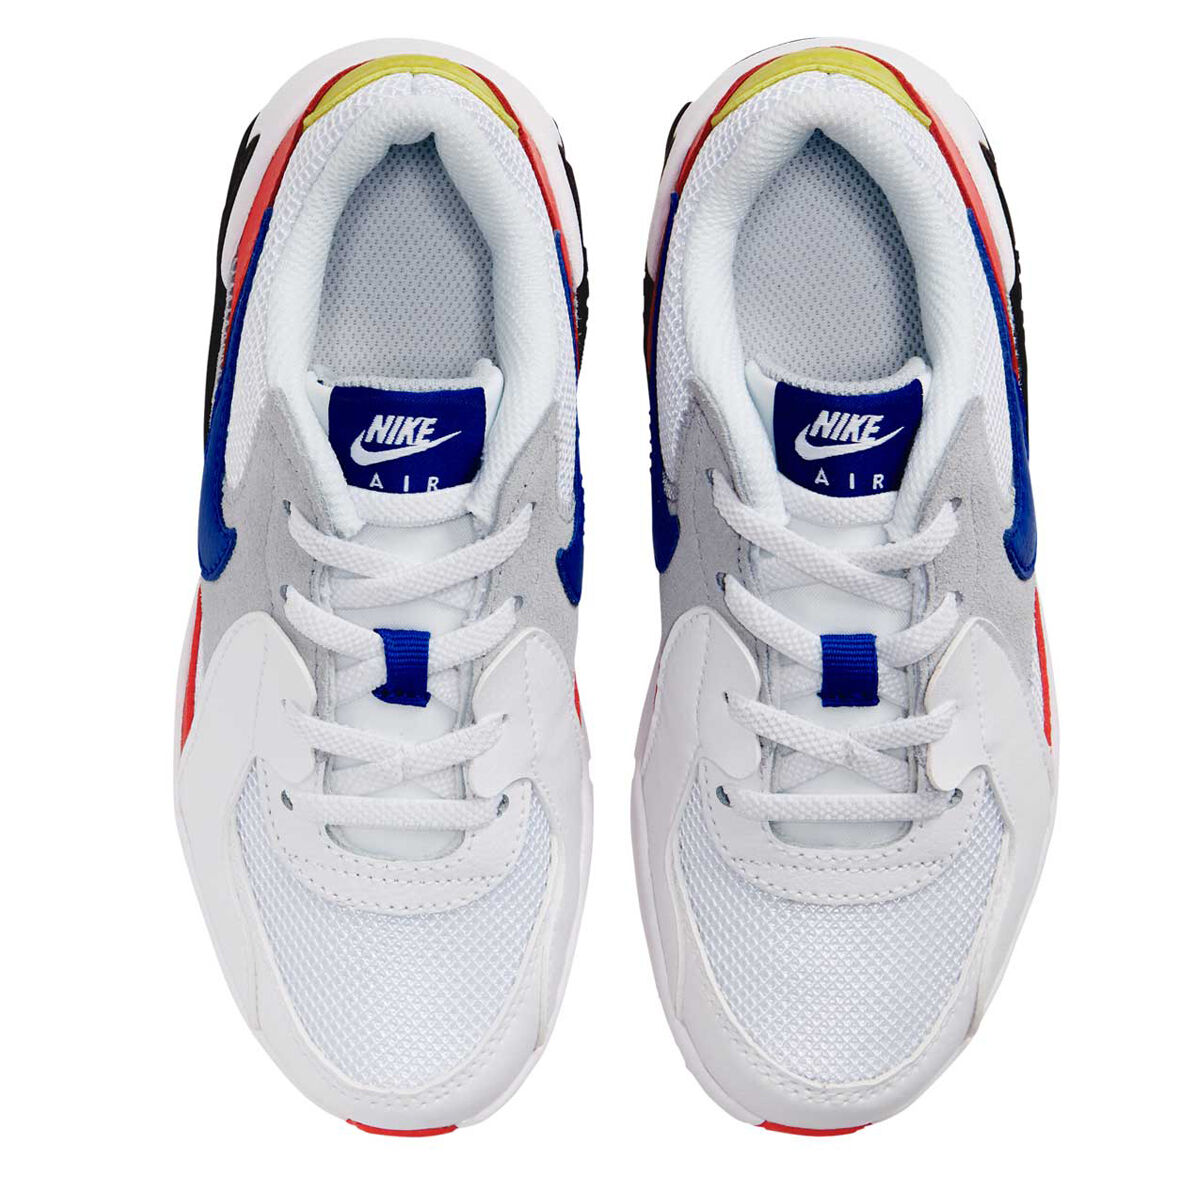 Boys Shoes rebel